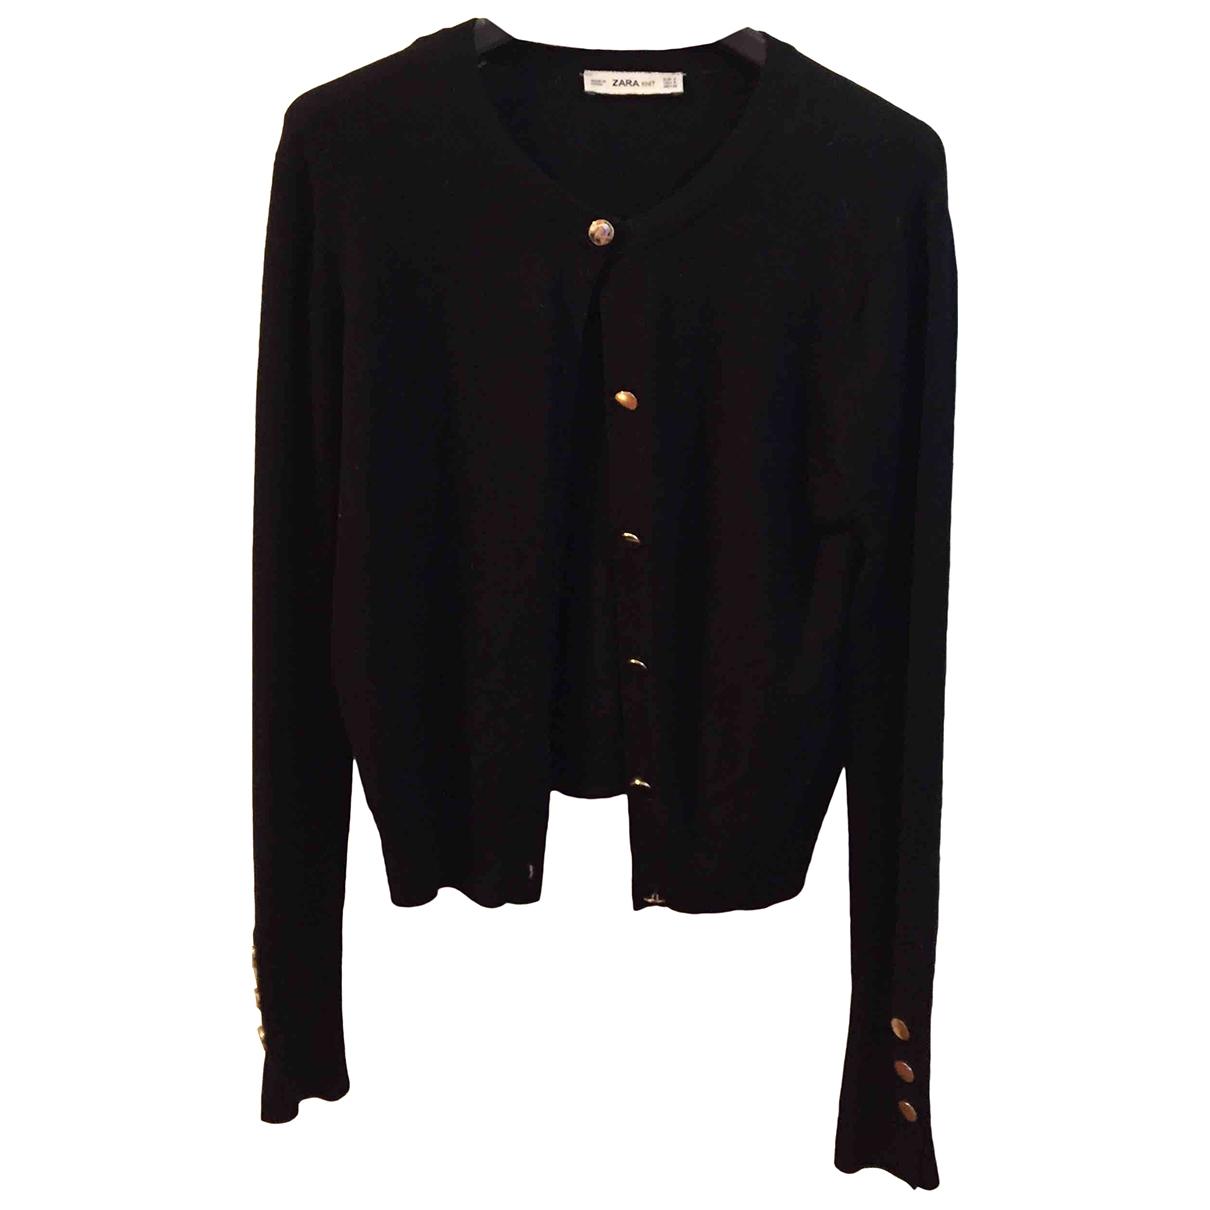 Zara \N Pullover in  Schwarz Viskose